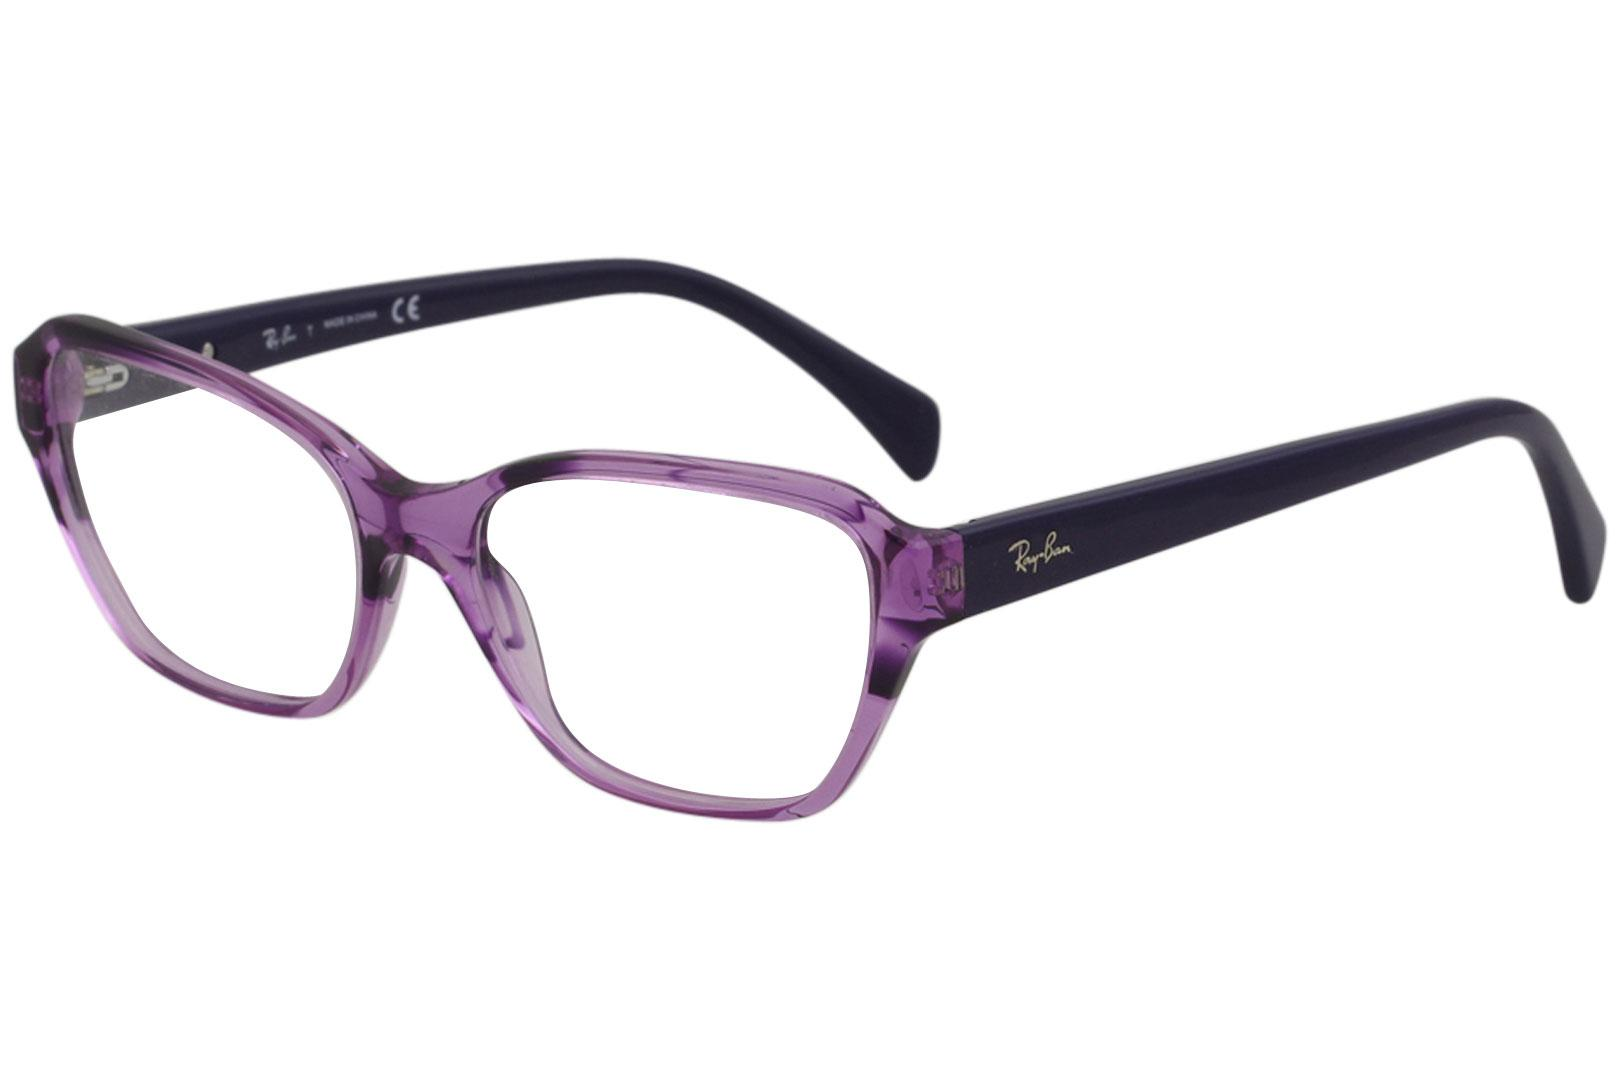 d40af02e78d Ray Ban Women s Eyeglasses RX5341 RX 5341 RayBan Full Rim Optical Frame